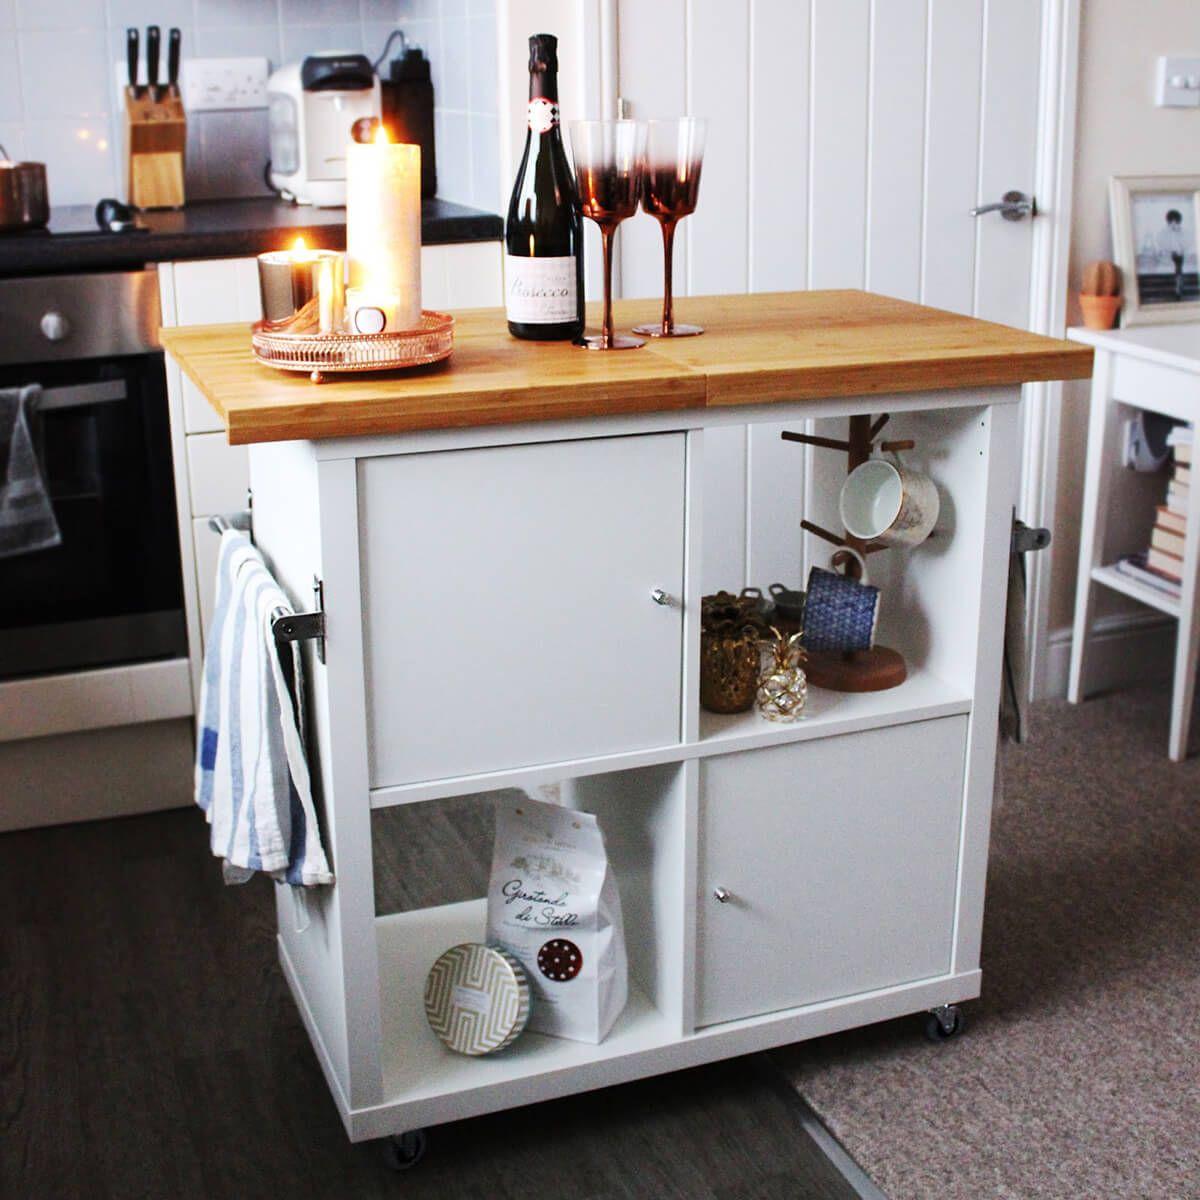 50+ Genius IKEA Hacks that are Cheap & Easy to Recreate